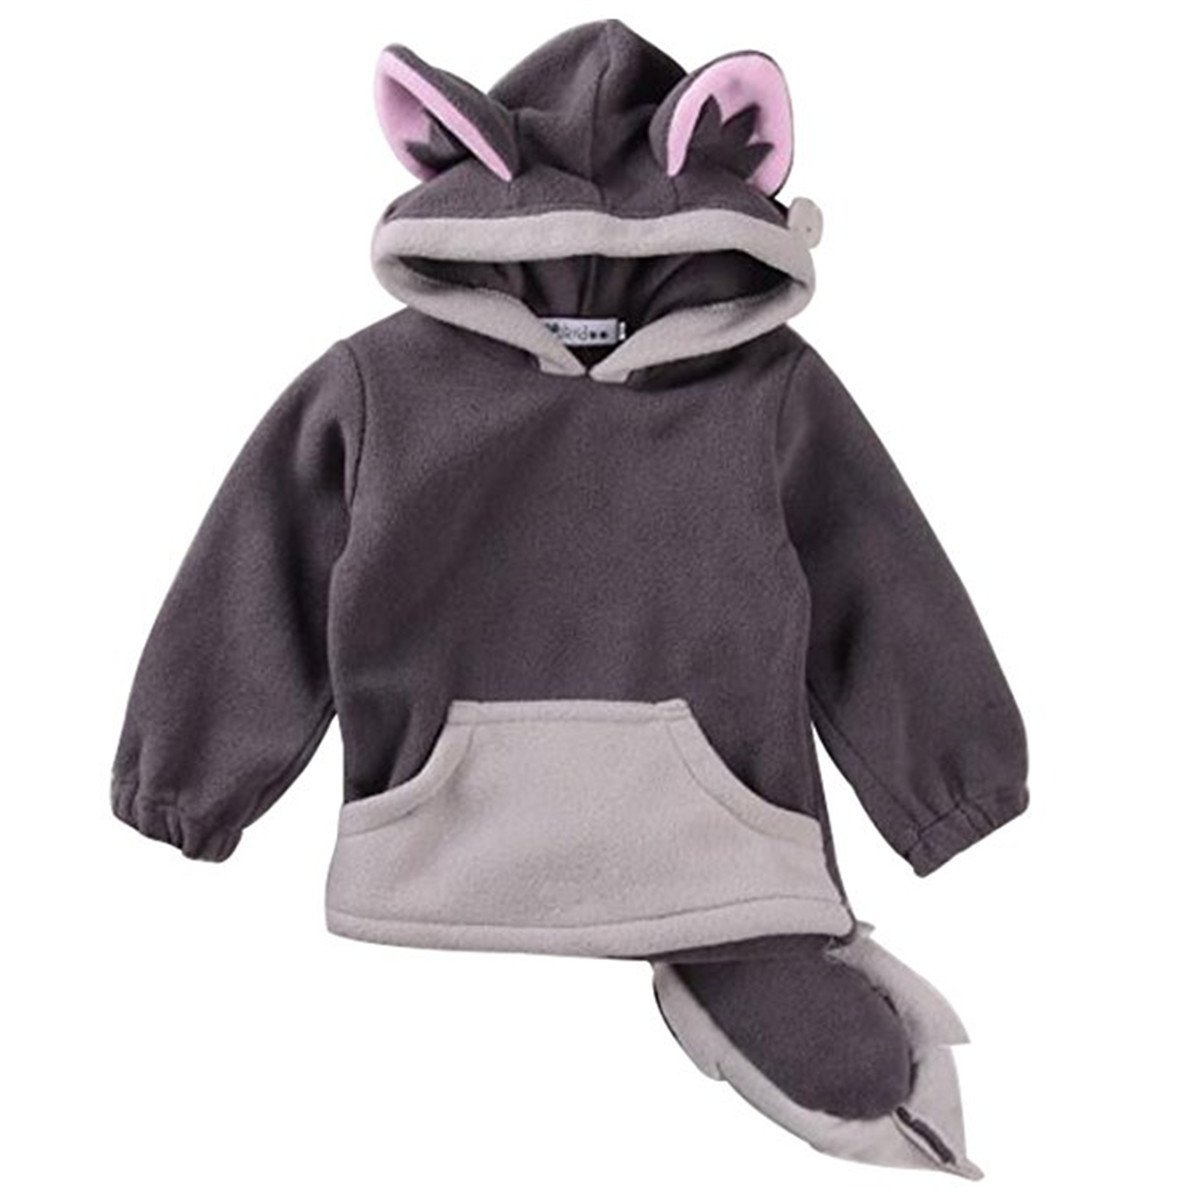 REWANGOING Little Girls Cute Fox Hoodie Pullover Cape Cloak Outwear Coat VLOKCOAT91